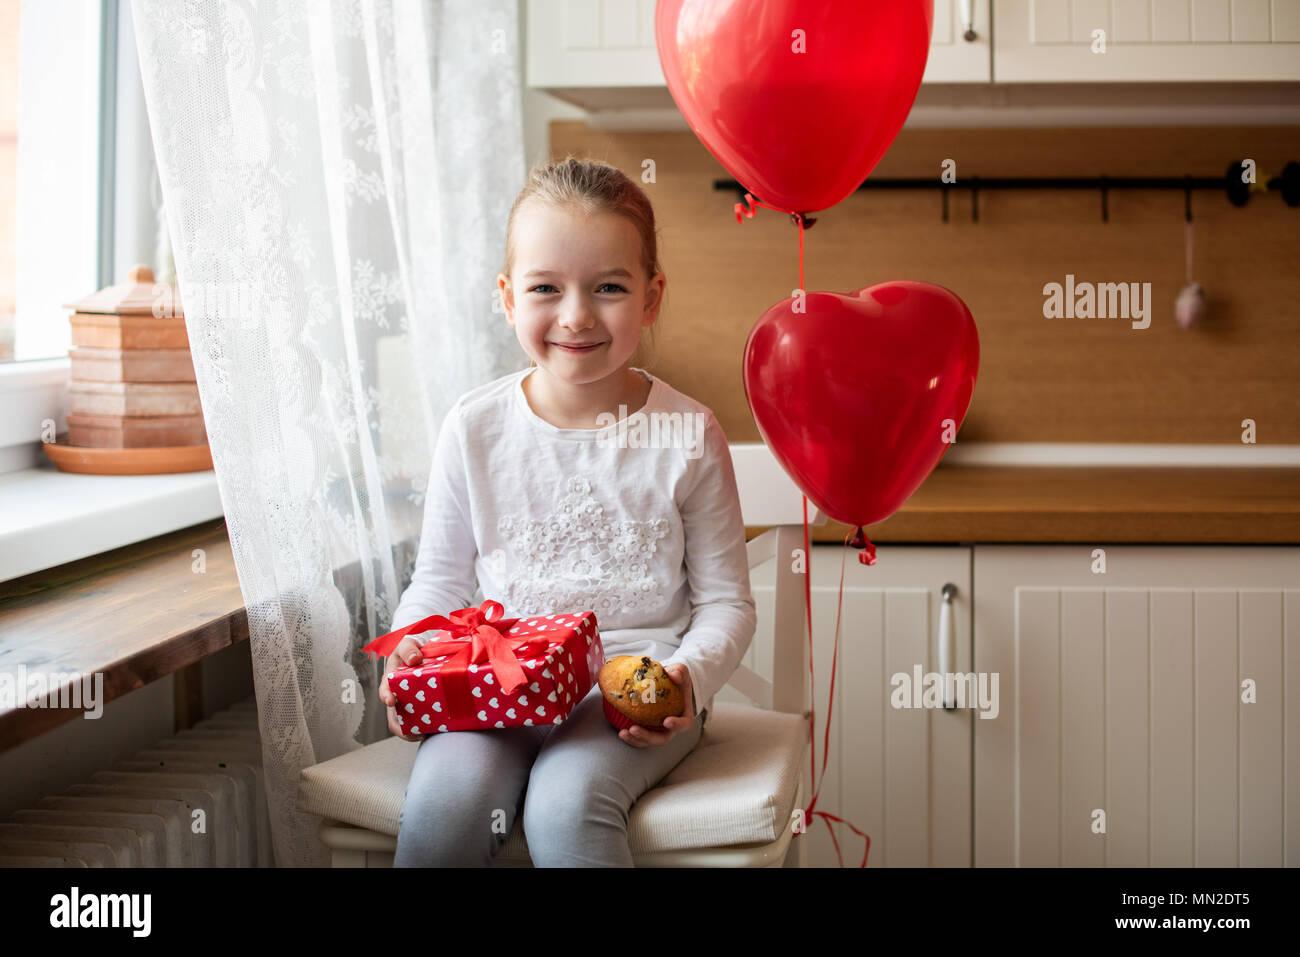 Cute girl bambin célébrer 6e anniversaire. Girl holding her birthday cupcake et joliment emballé présent, assis entouré par des ballons. Photo Stock